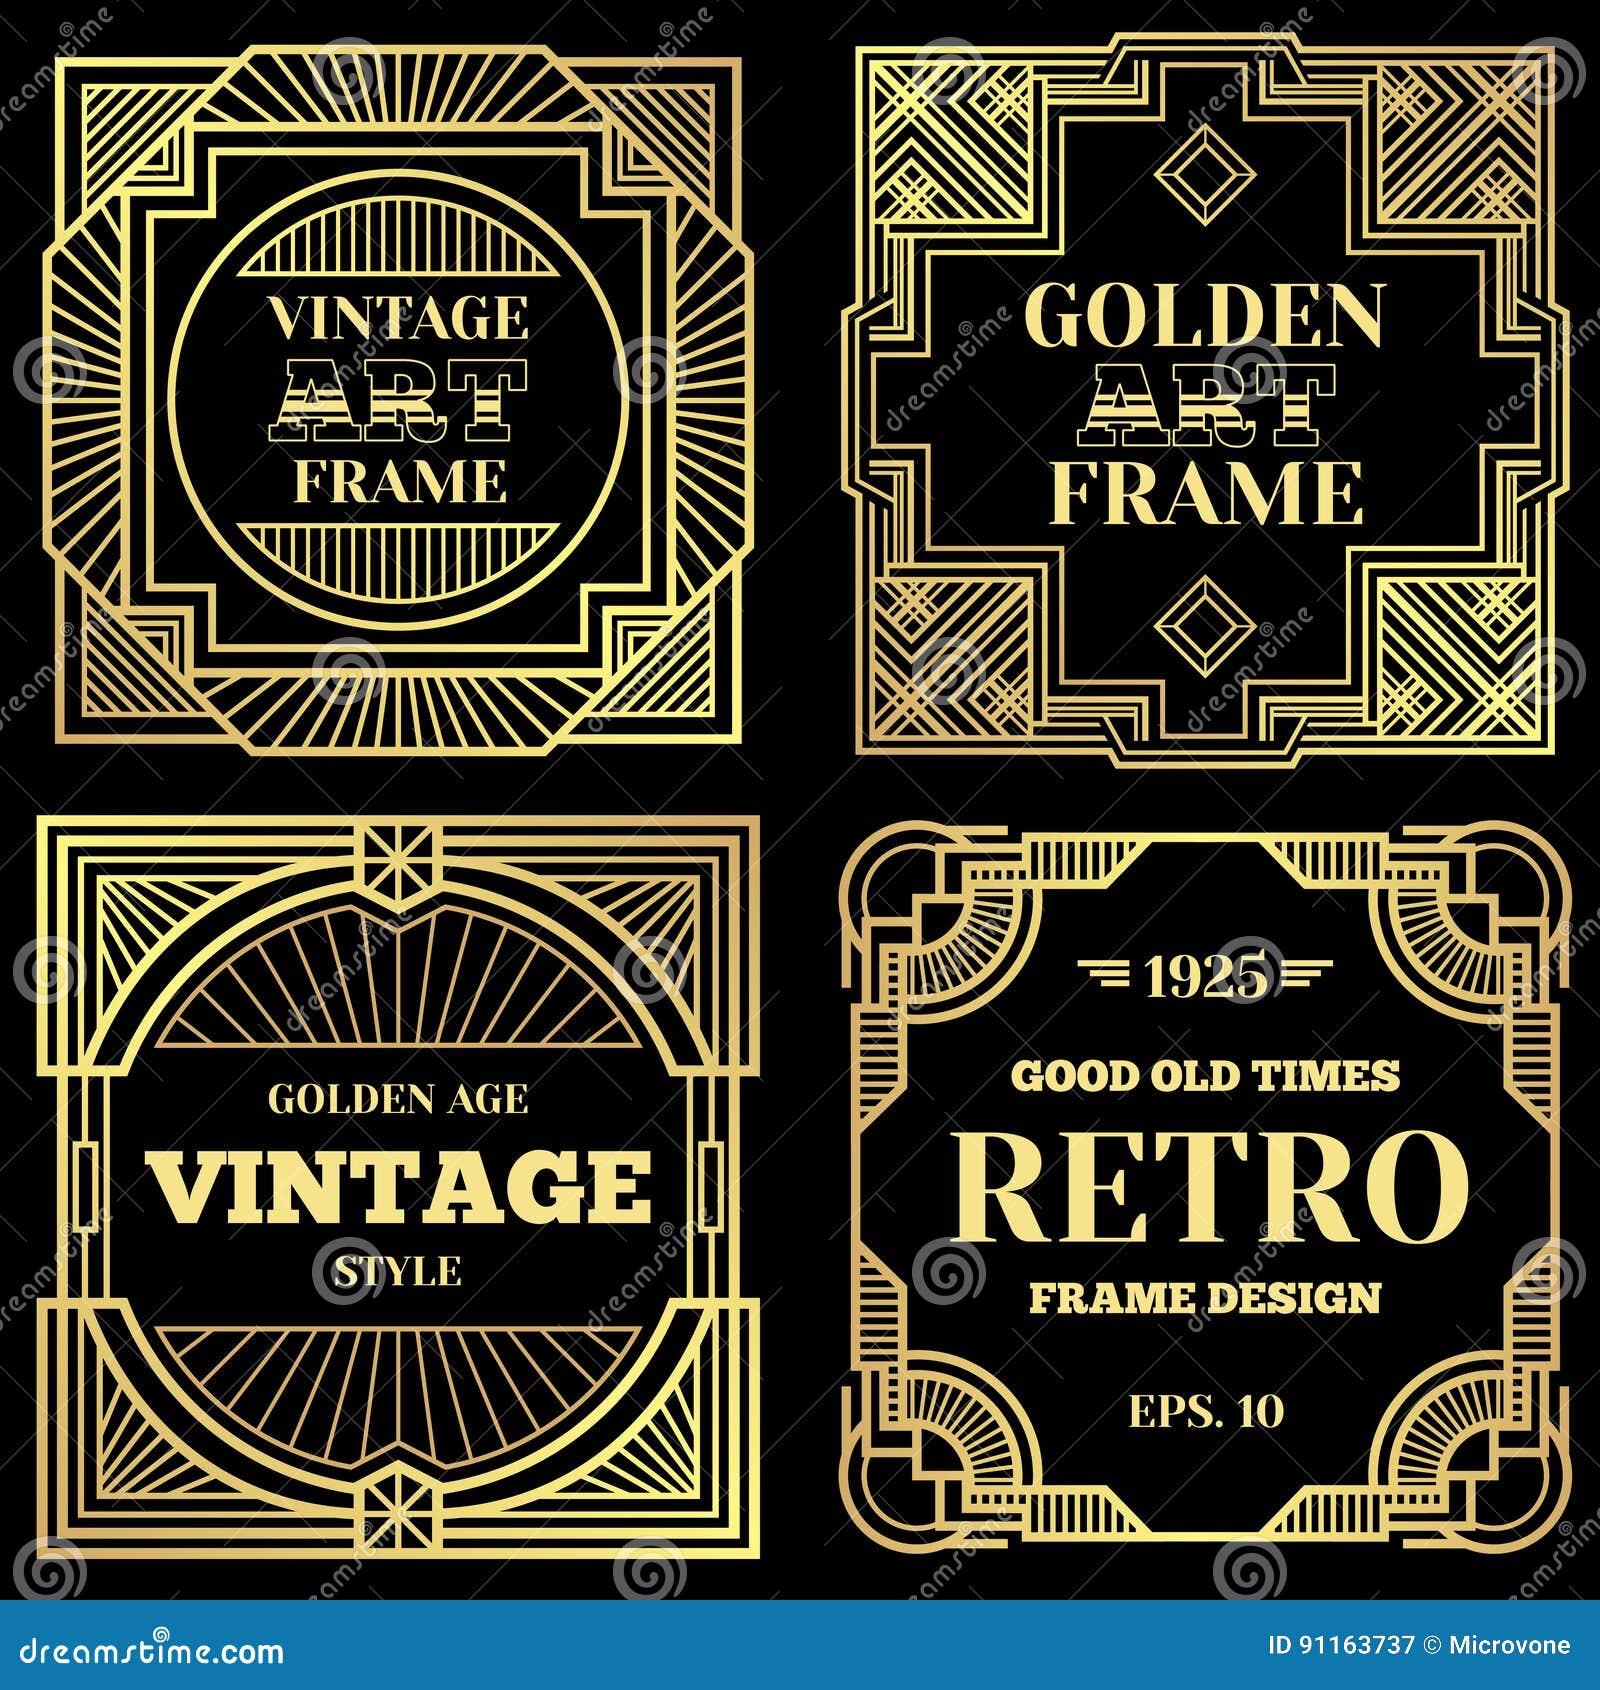 Art Deco Design Posters